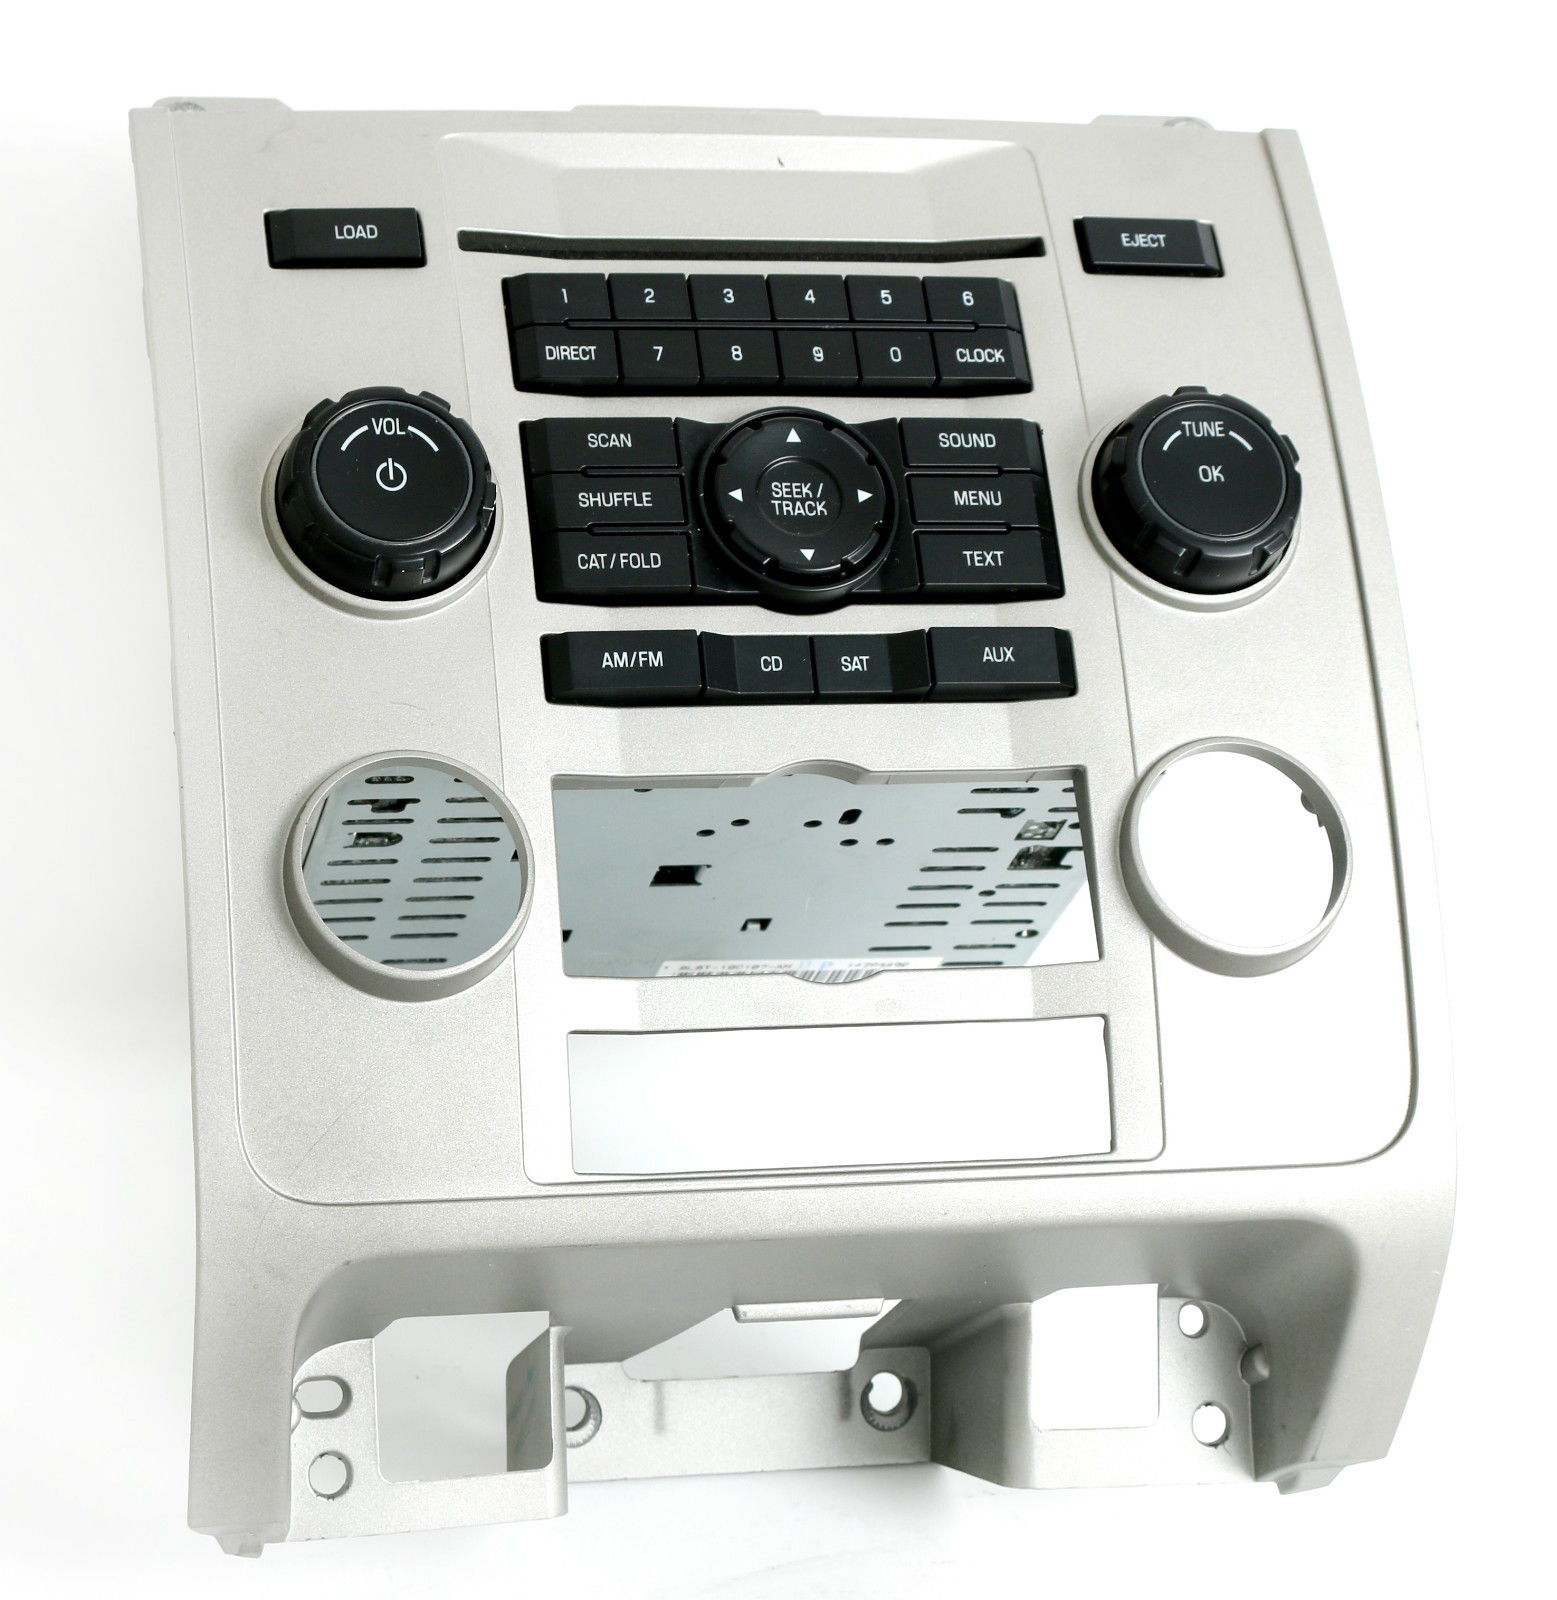 Ford Escape Mercury Mariner 2008 Radio AM FM MP3 CD Player - Part 8